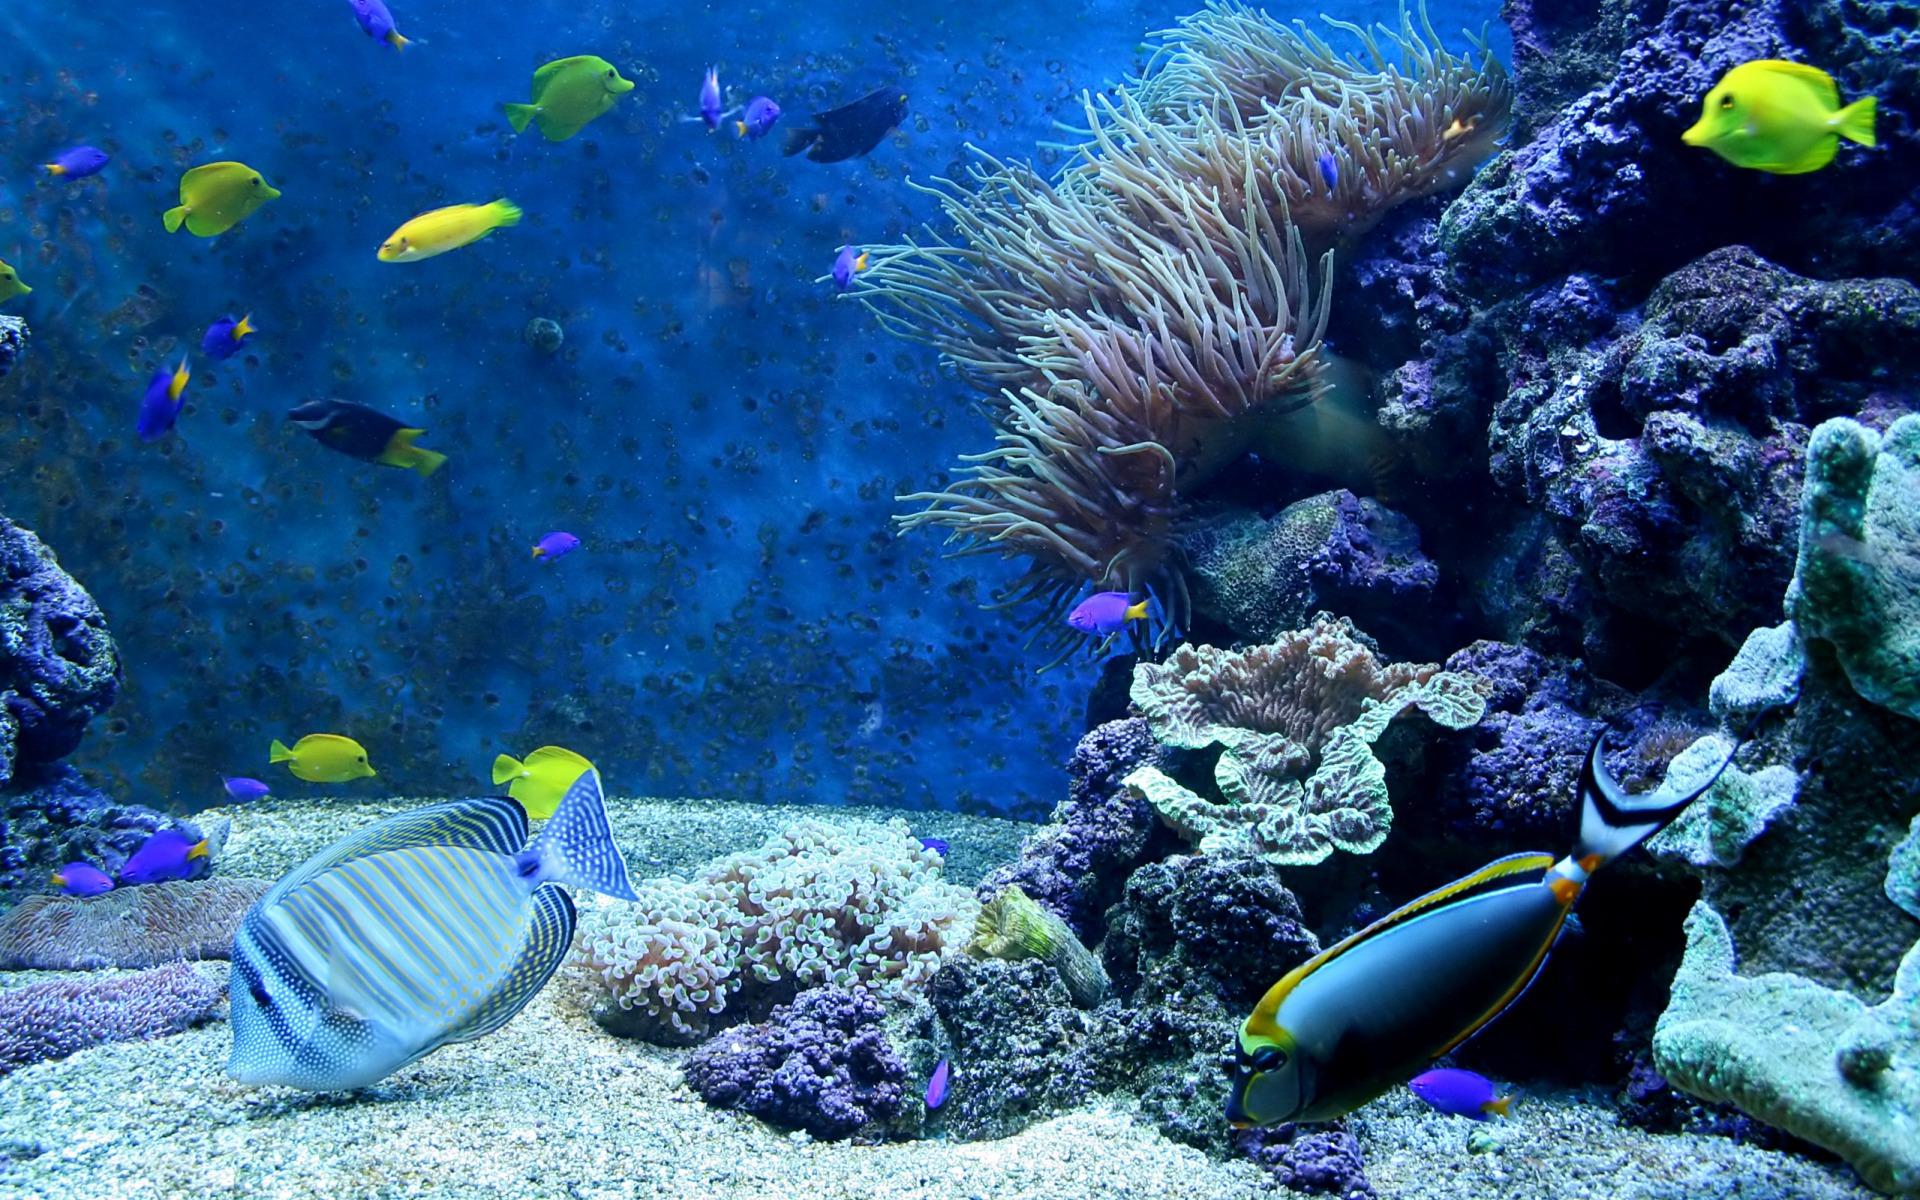 coral reef wallpaper widescreen wallpapersafari. Black Bedroom Furniture Sets. Home Design Ideas